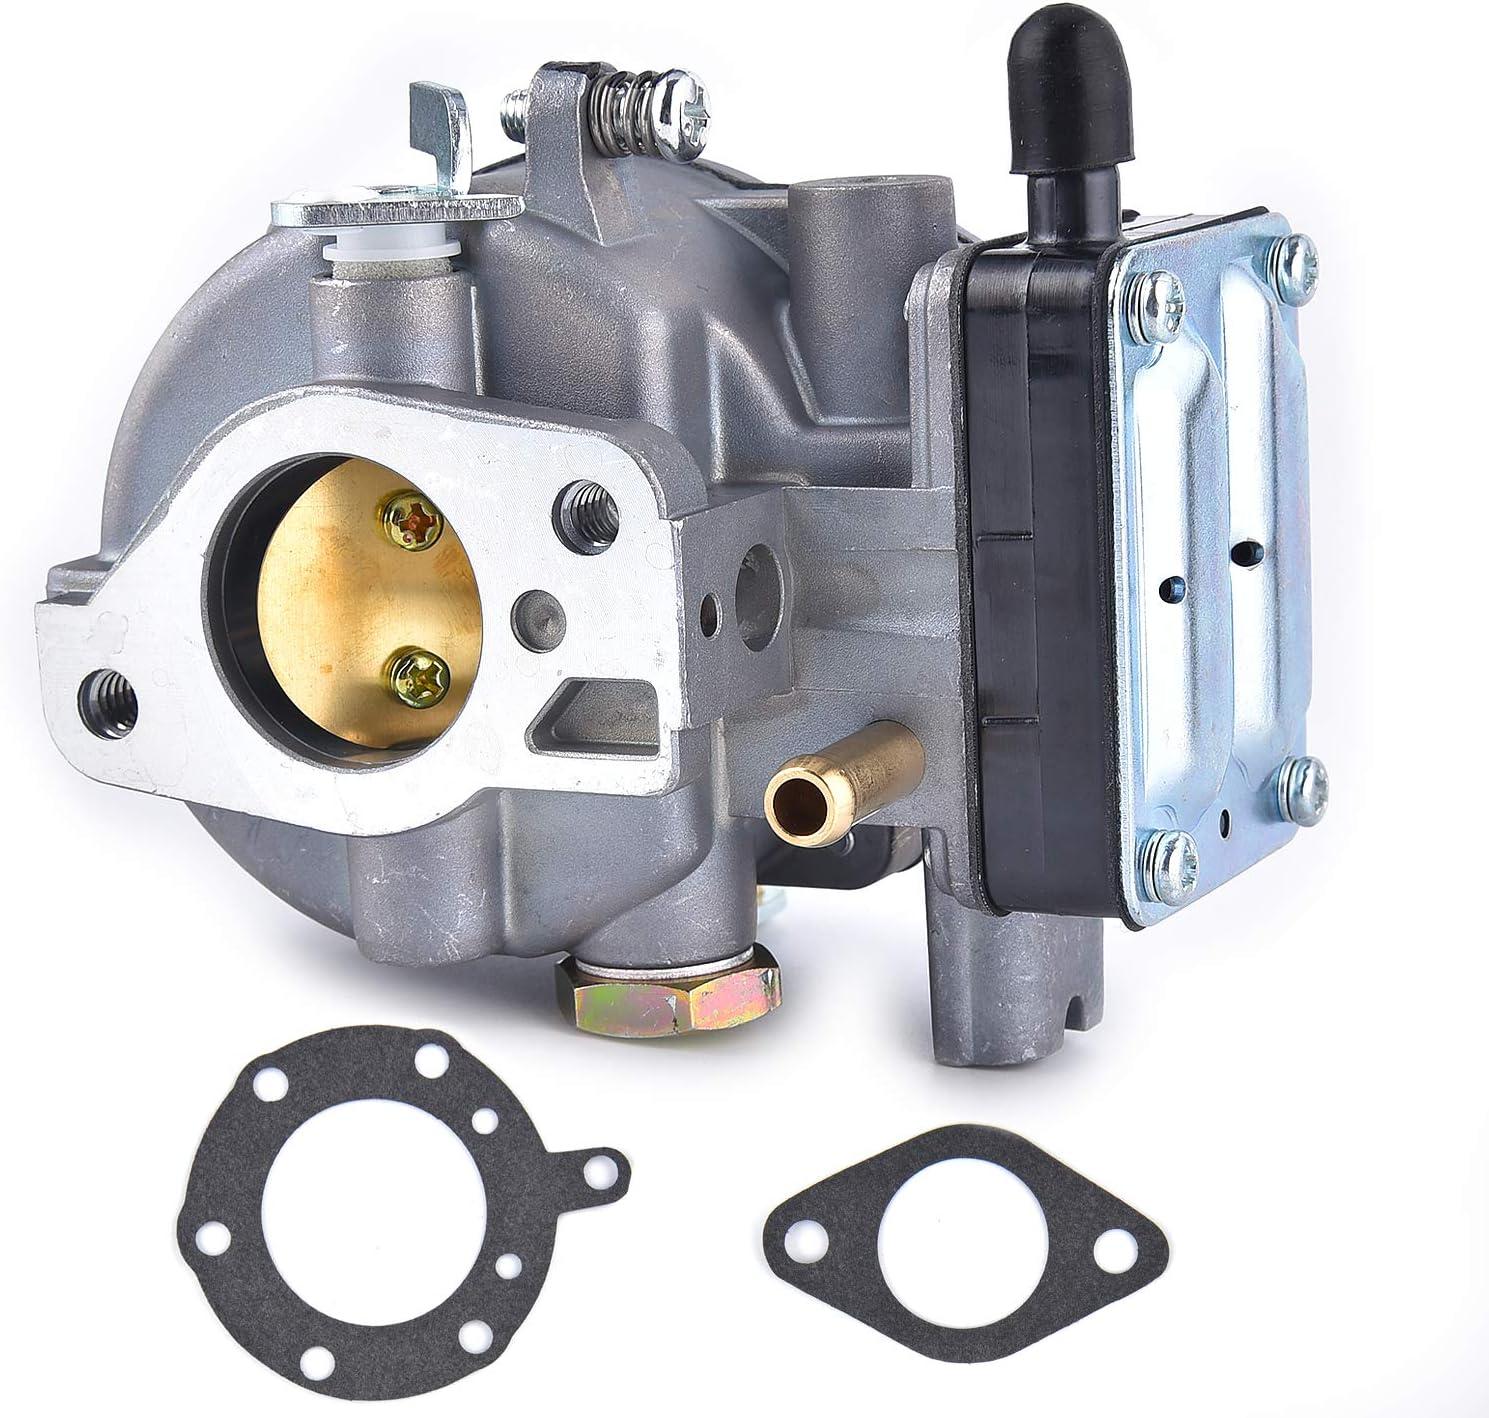 Carburetor For Briggs /&Stratton 693480 499306 495181 495026 491535 491427 engine